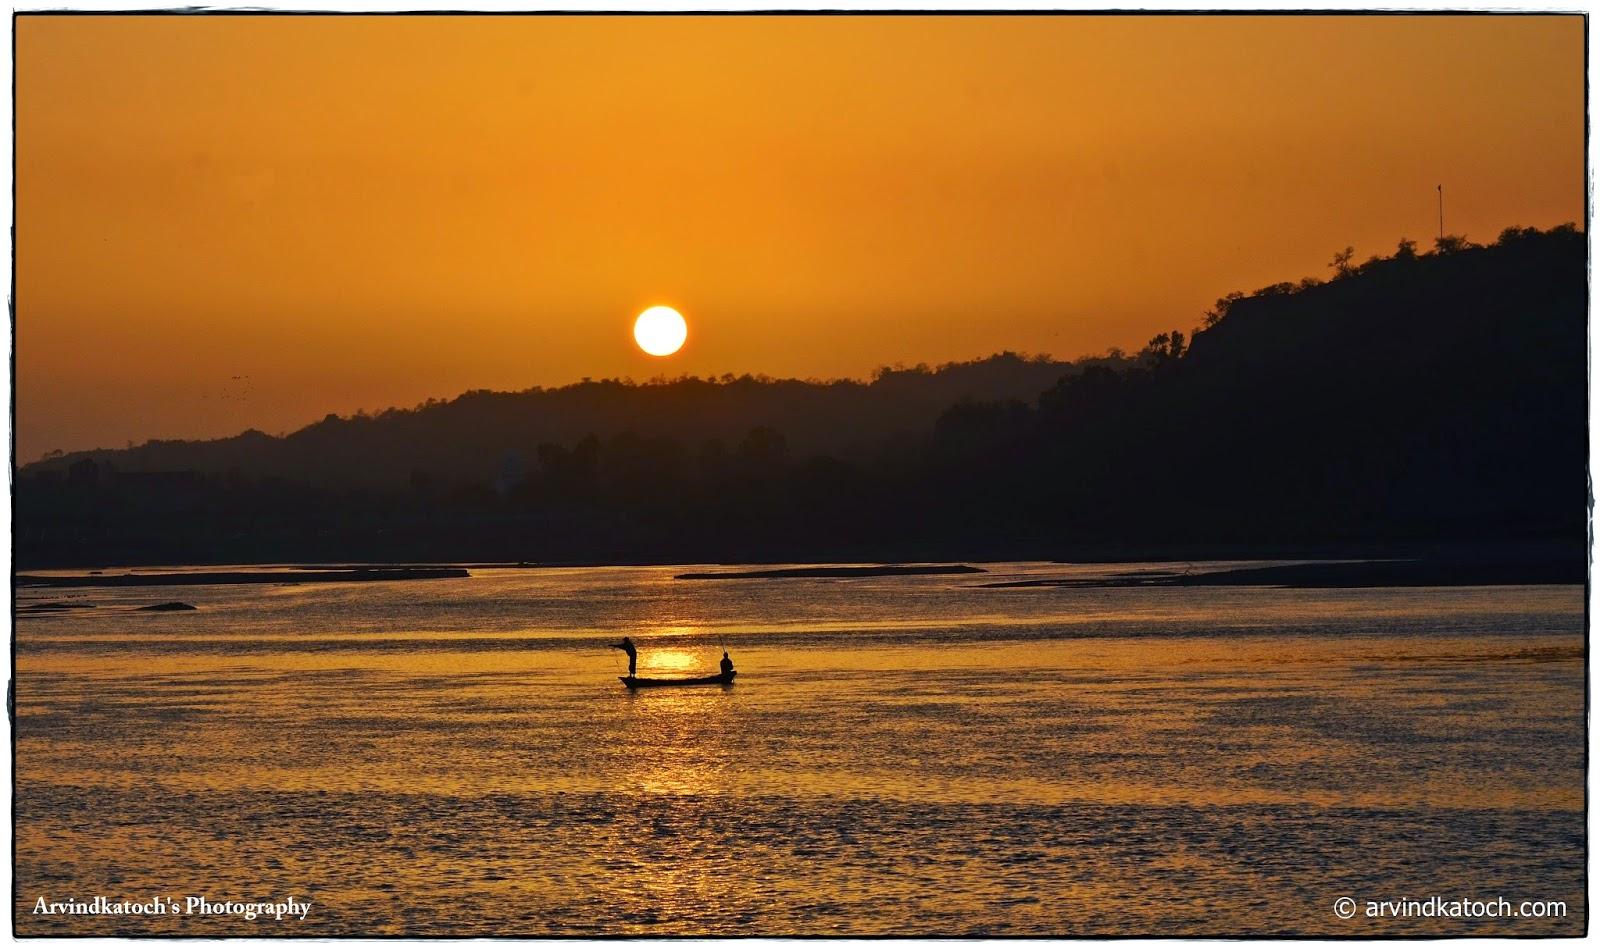 Ropar Wetland, Rupnagar, Wetland, Ropar Lake, Lake, Fishermen, fishing boat,